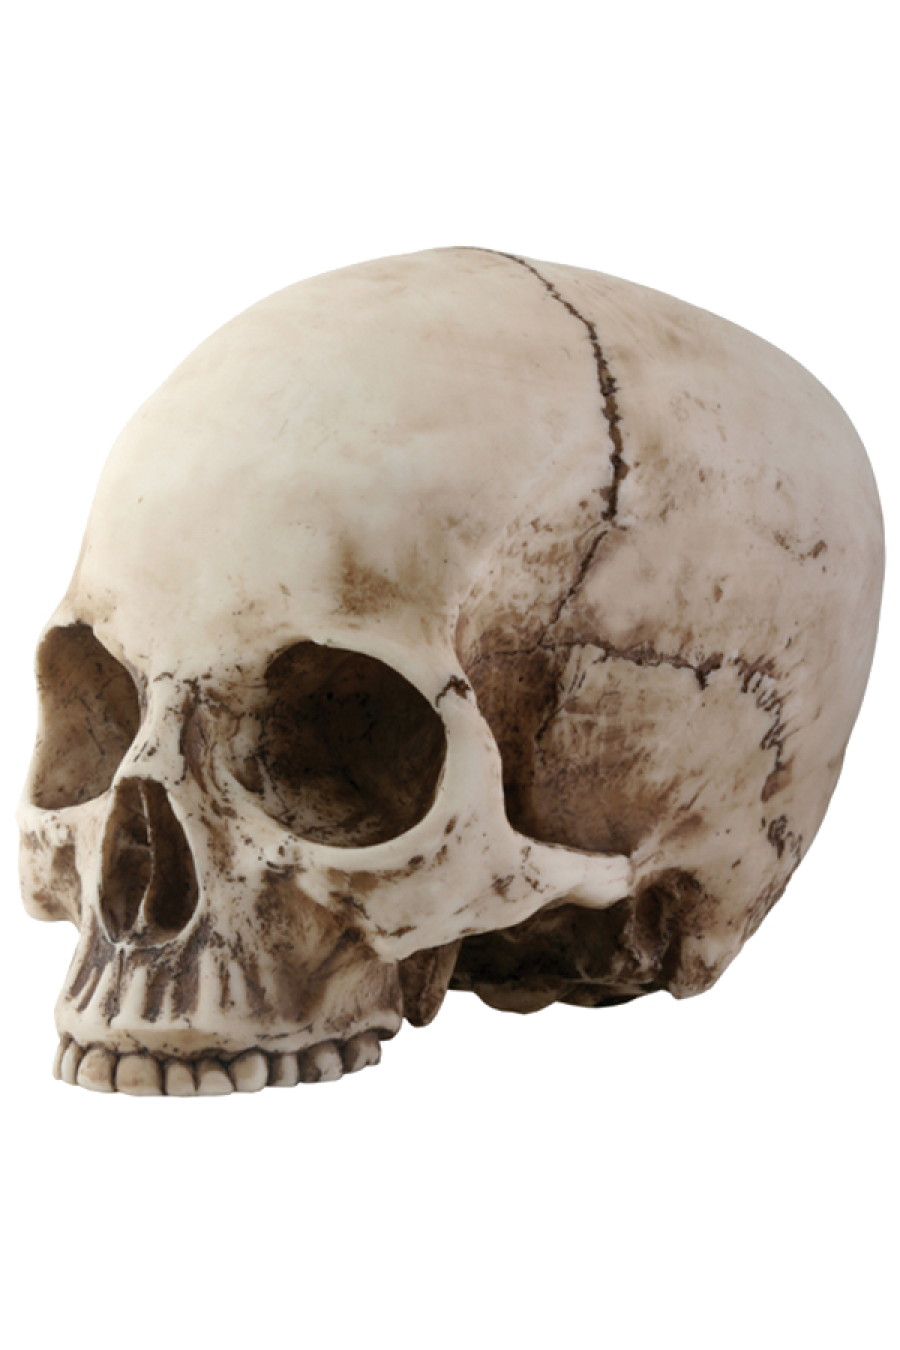 Skull PNG images free download.